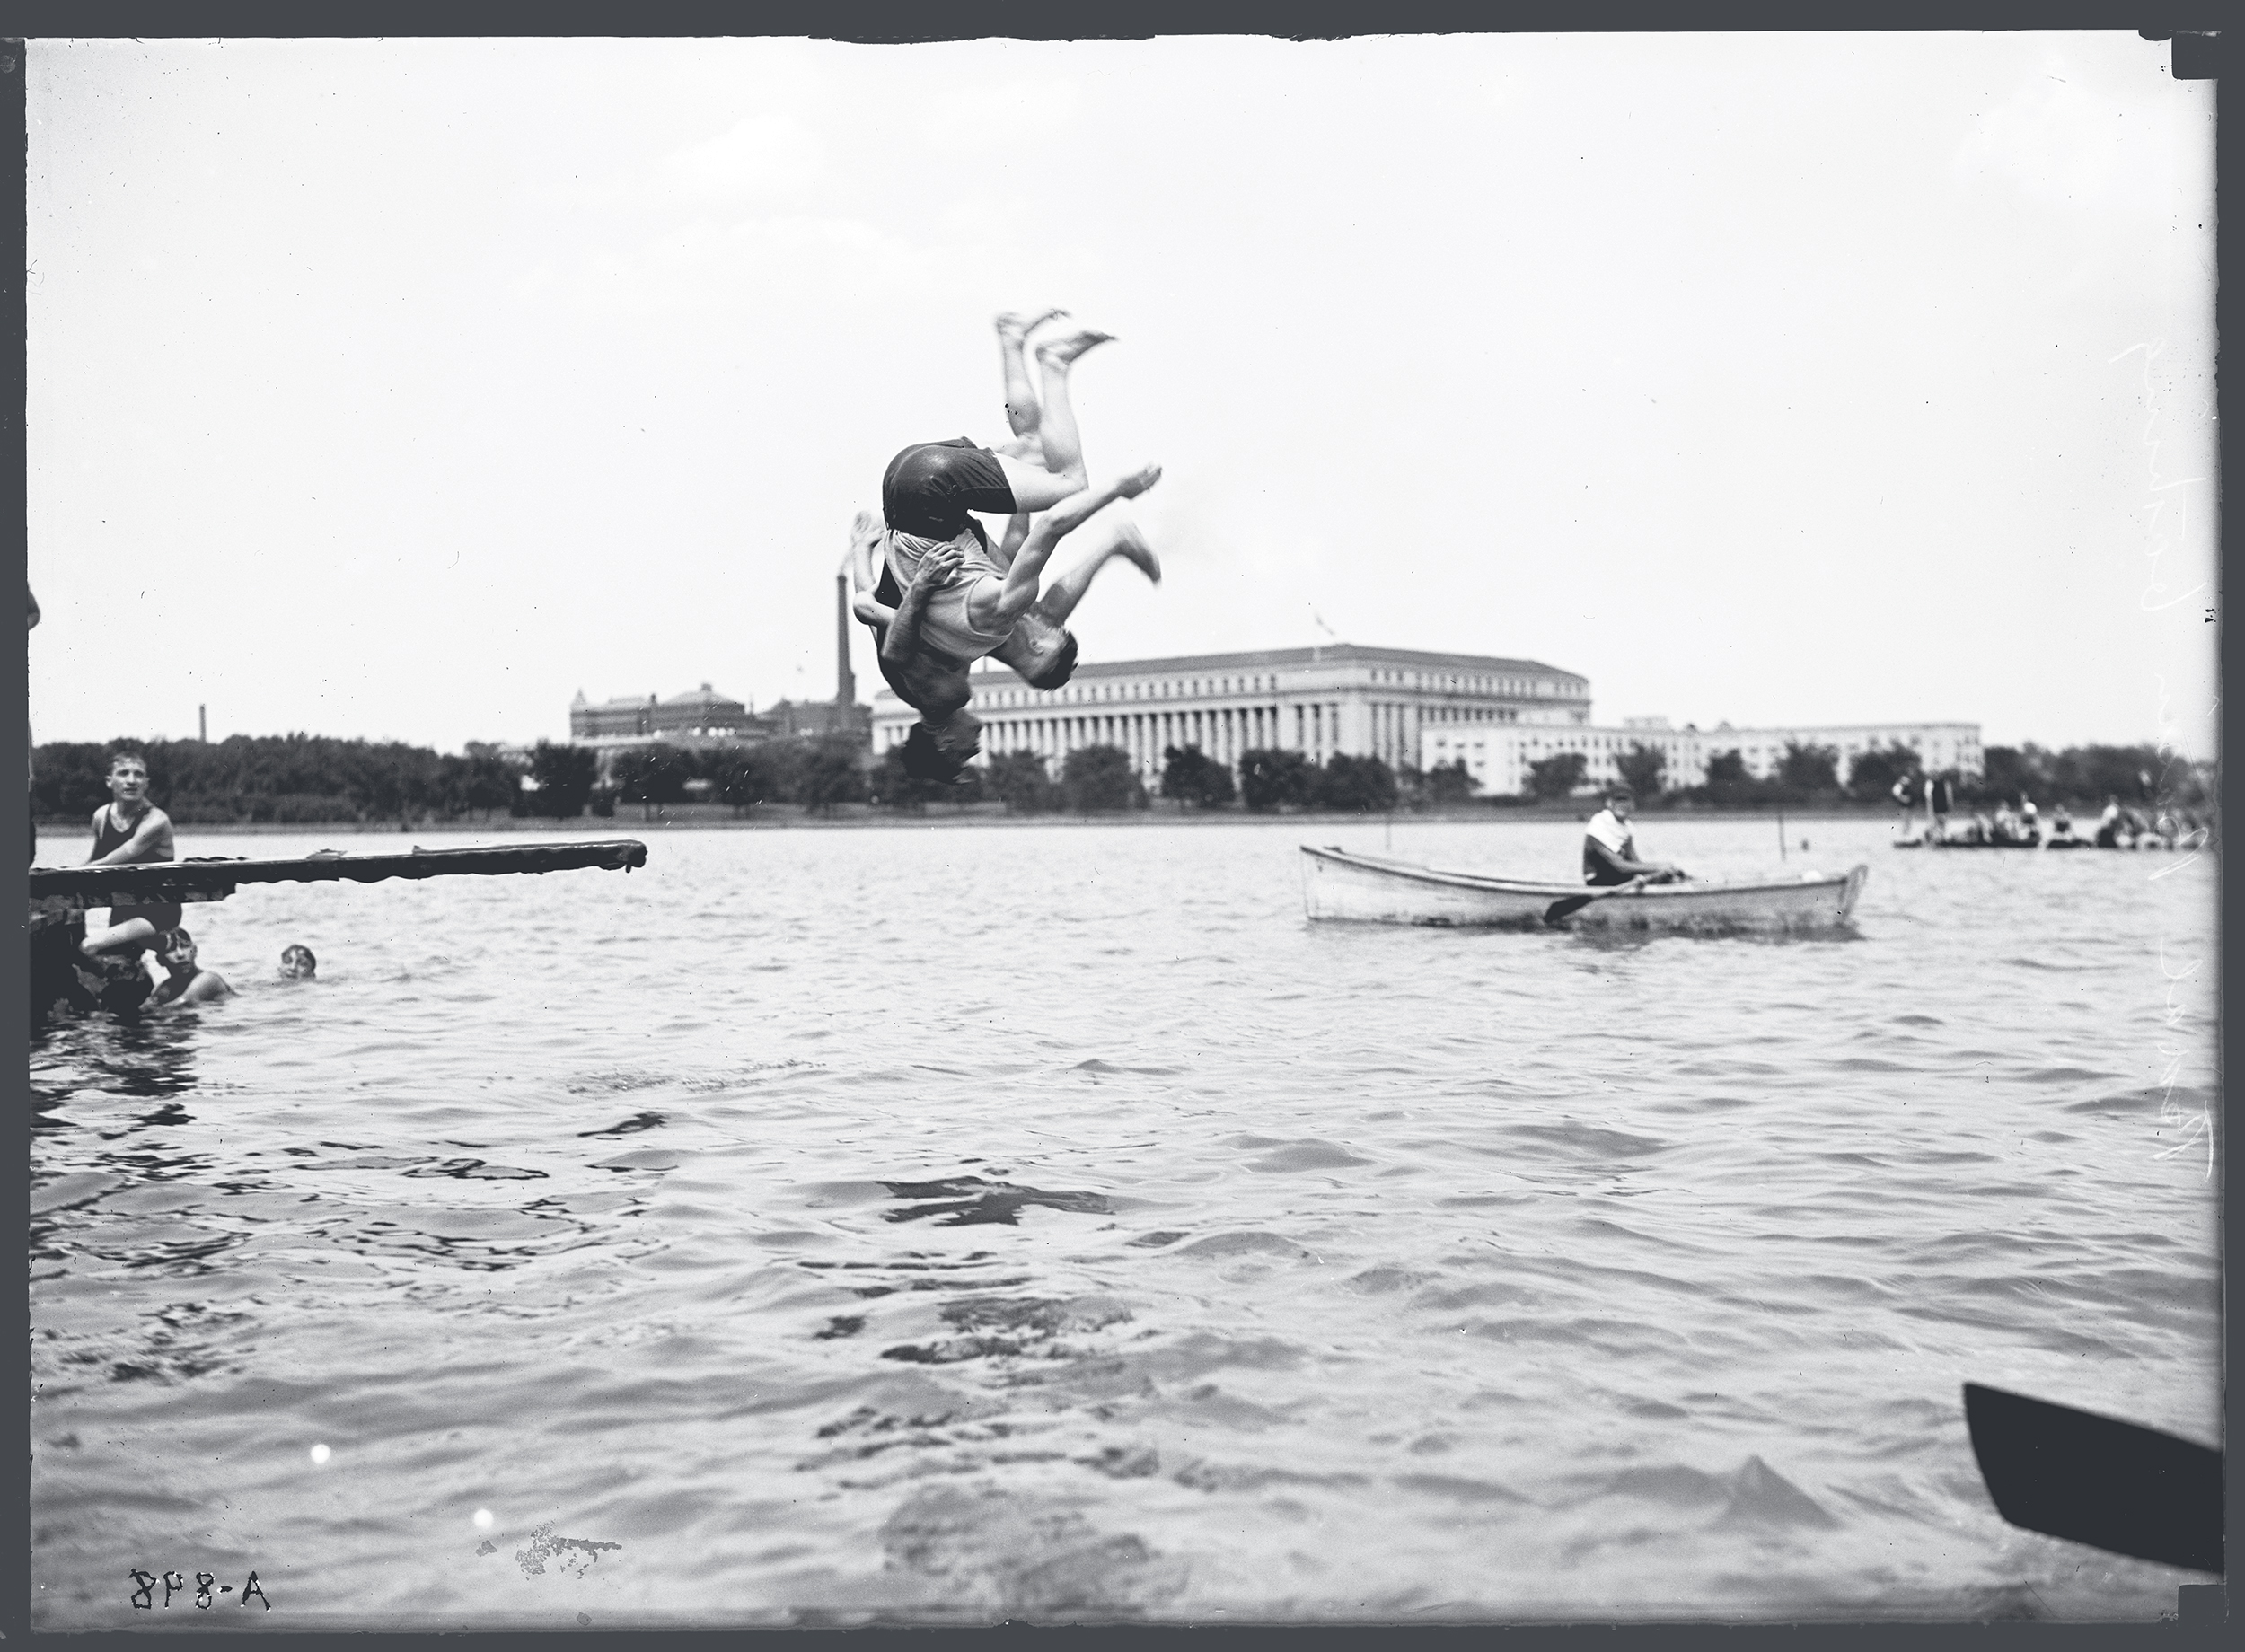 Photograph courtesy of Harris & Ewing/Library of Congress.